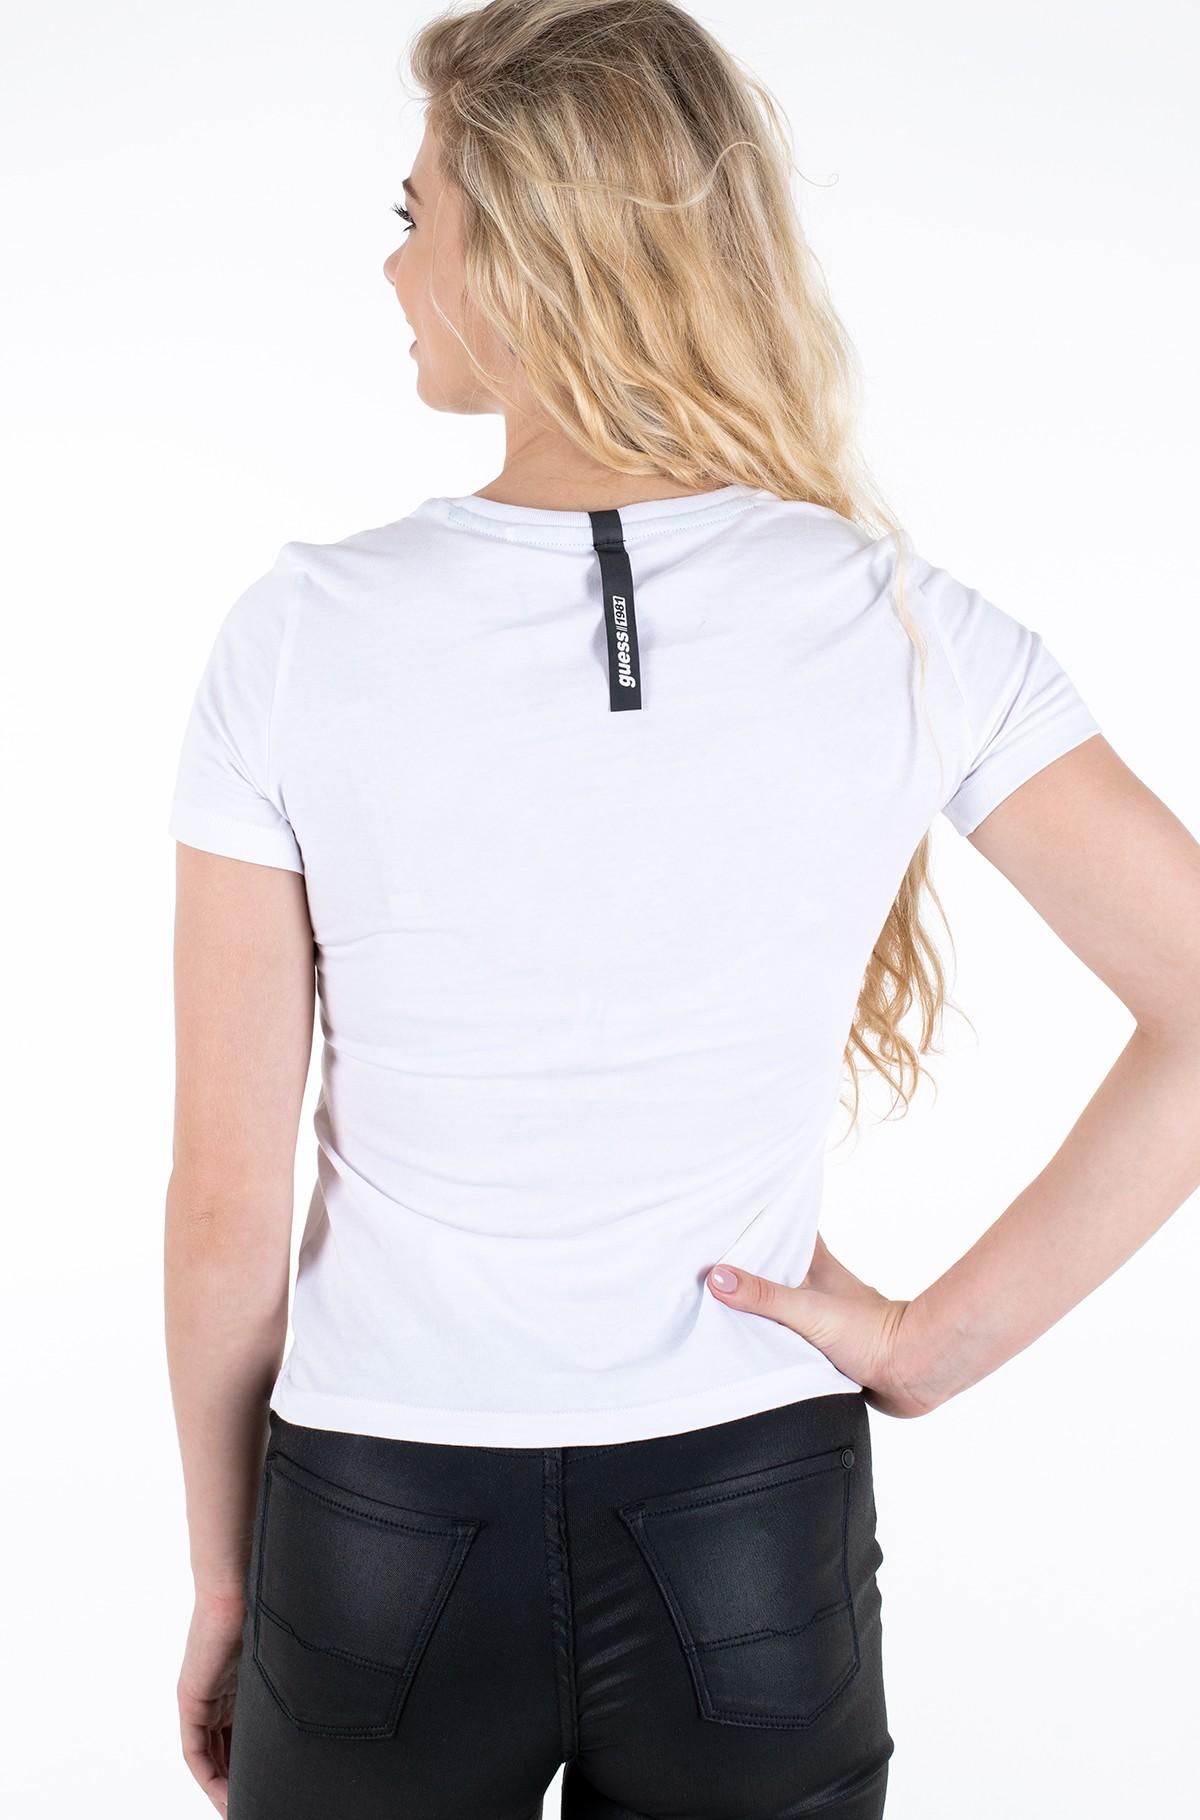 T-shirt W0BI14 K7DN0-full-2